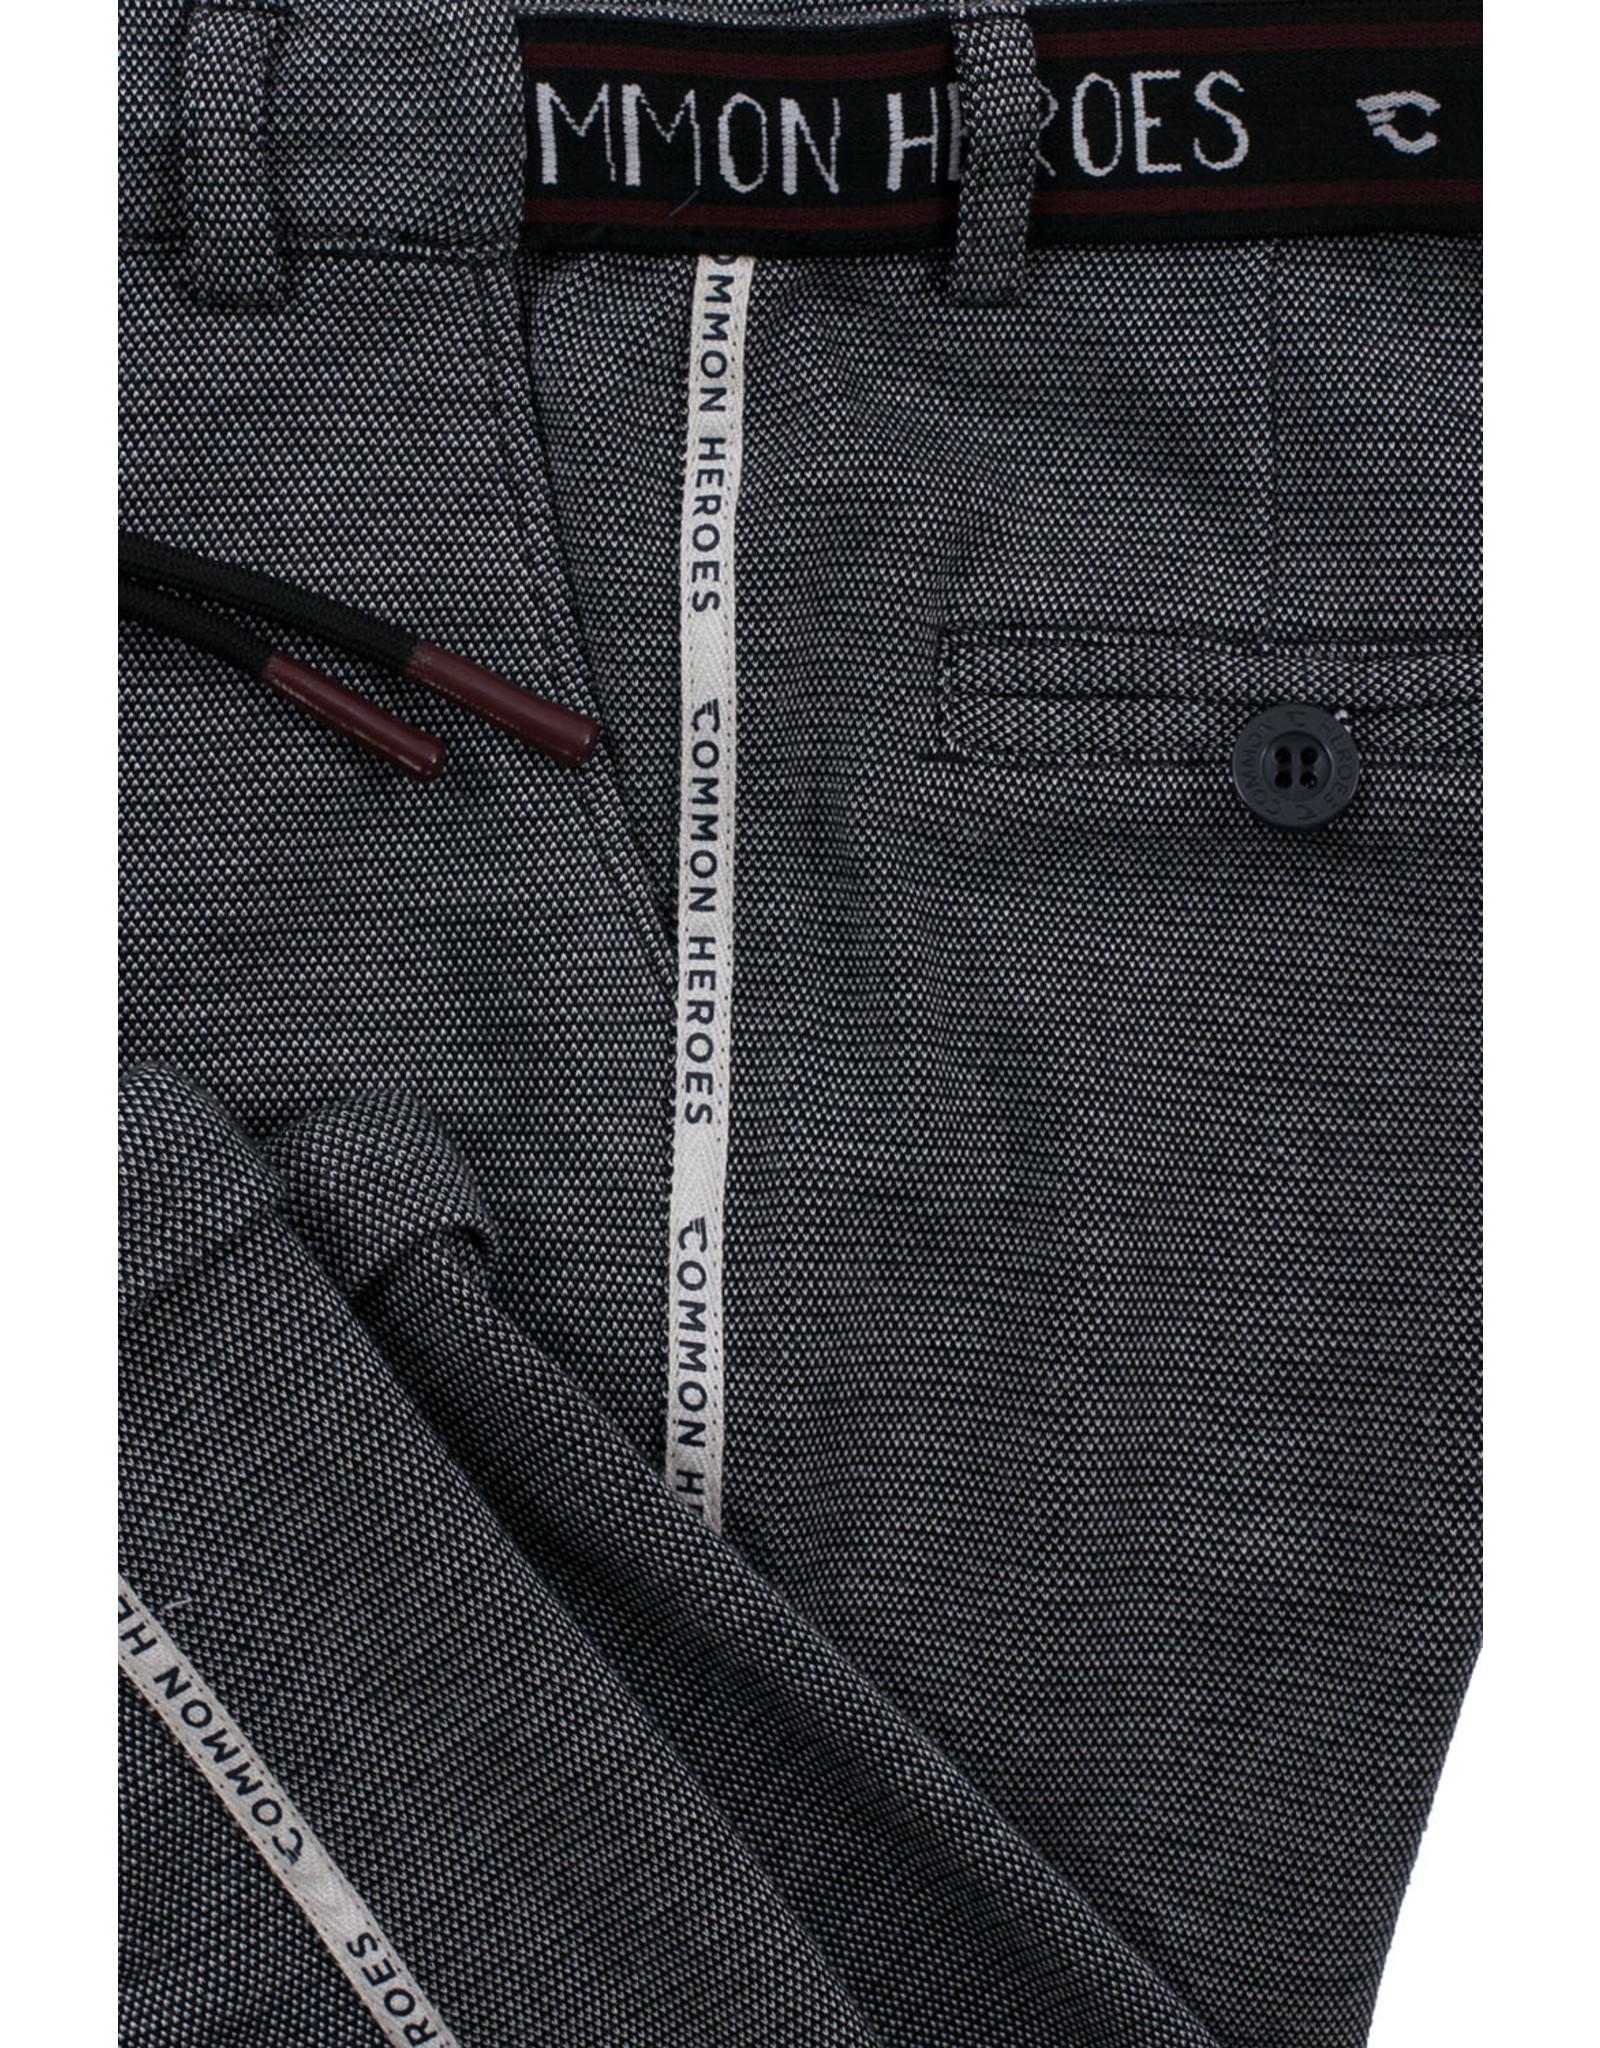 Common Heroes BAAS Fancy Chino sweat pants Black glitter